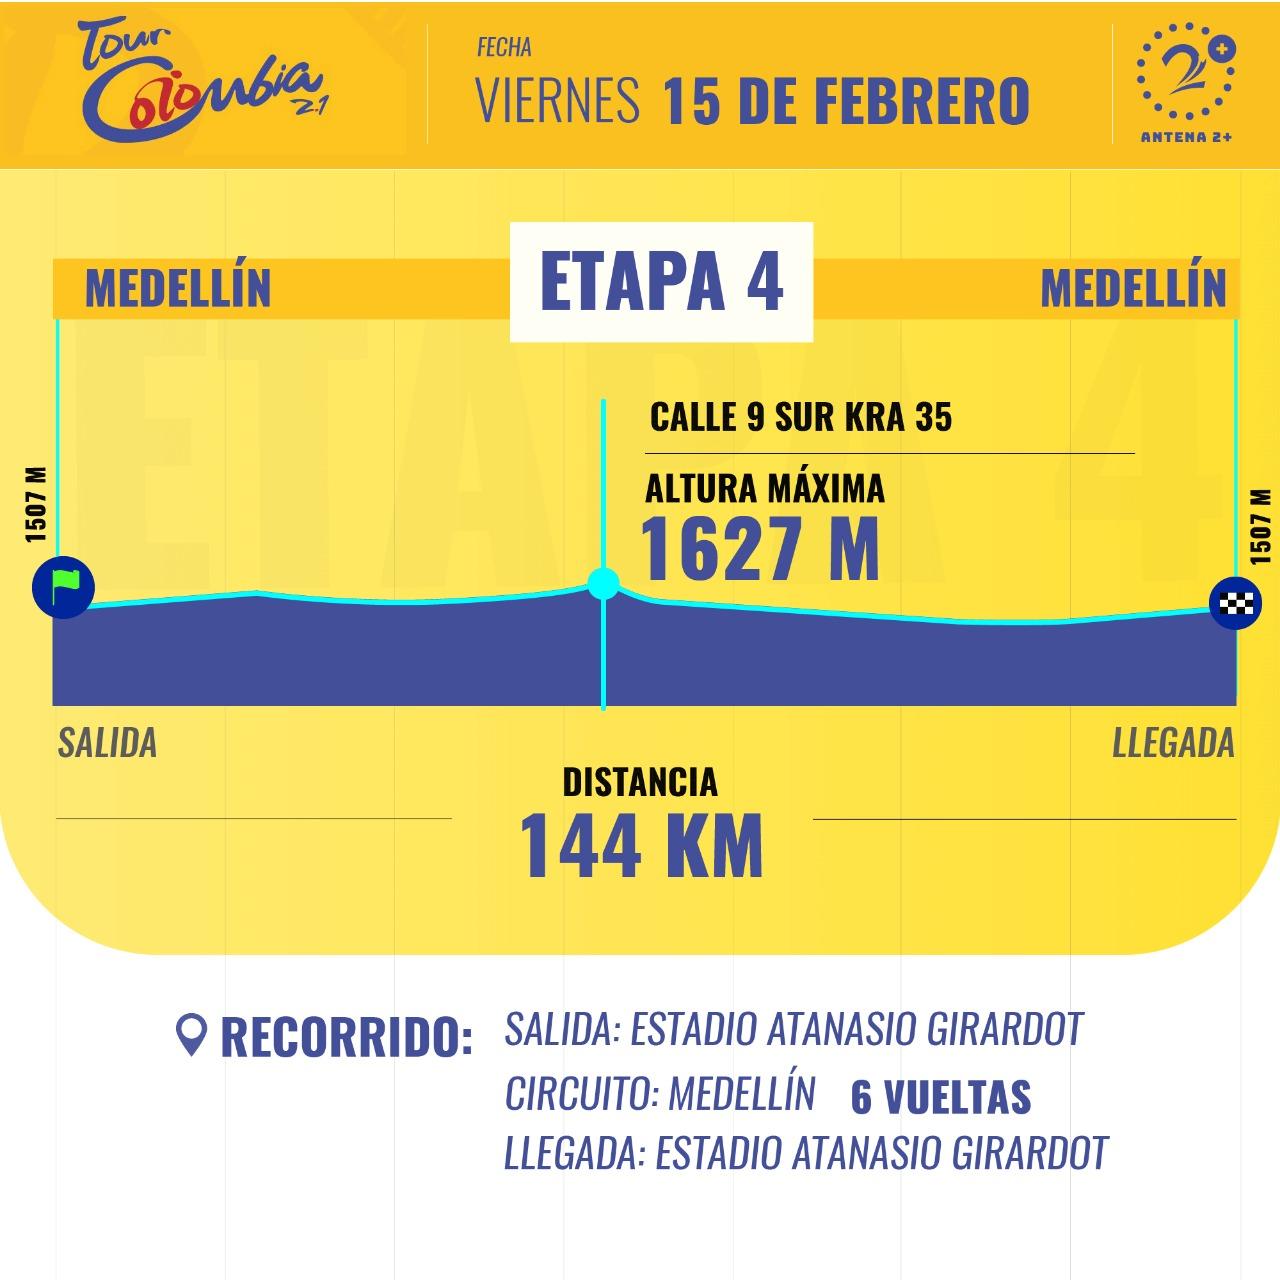 Etapa 4 del Tour Colombia 2.1